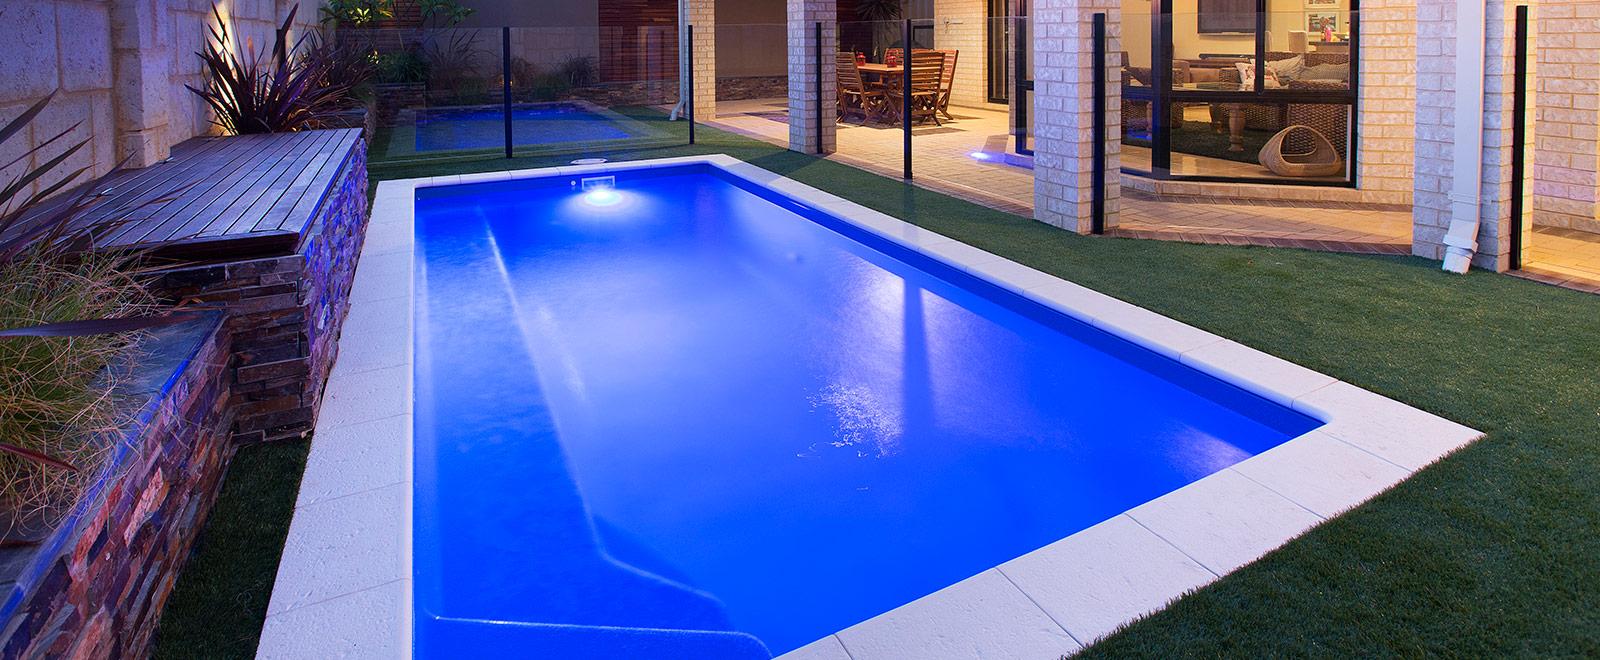 Fibreglass swimming pools perth wa buccaneer pools - Best way to finance a swimming pool ...